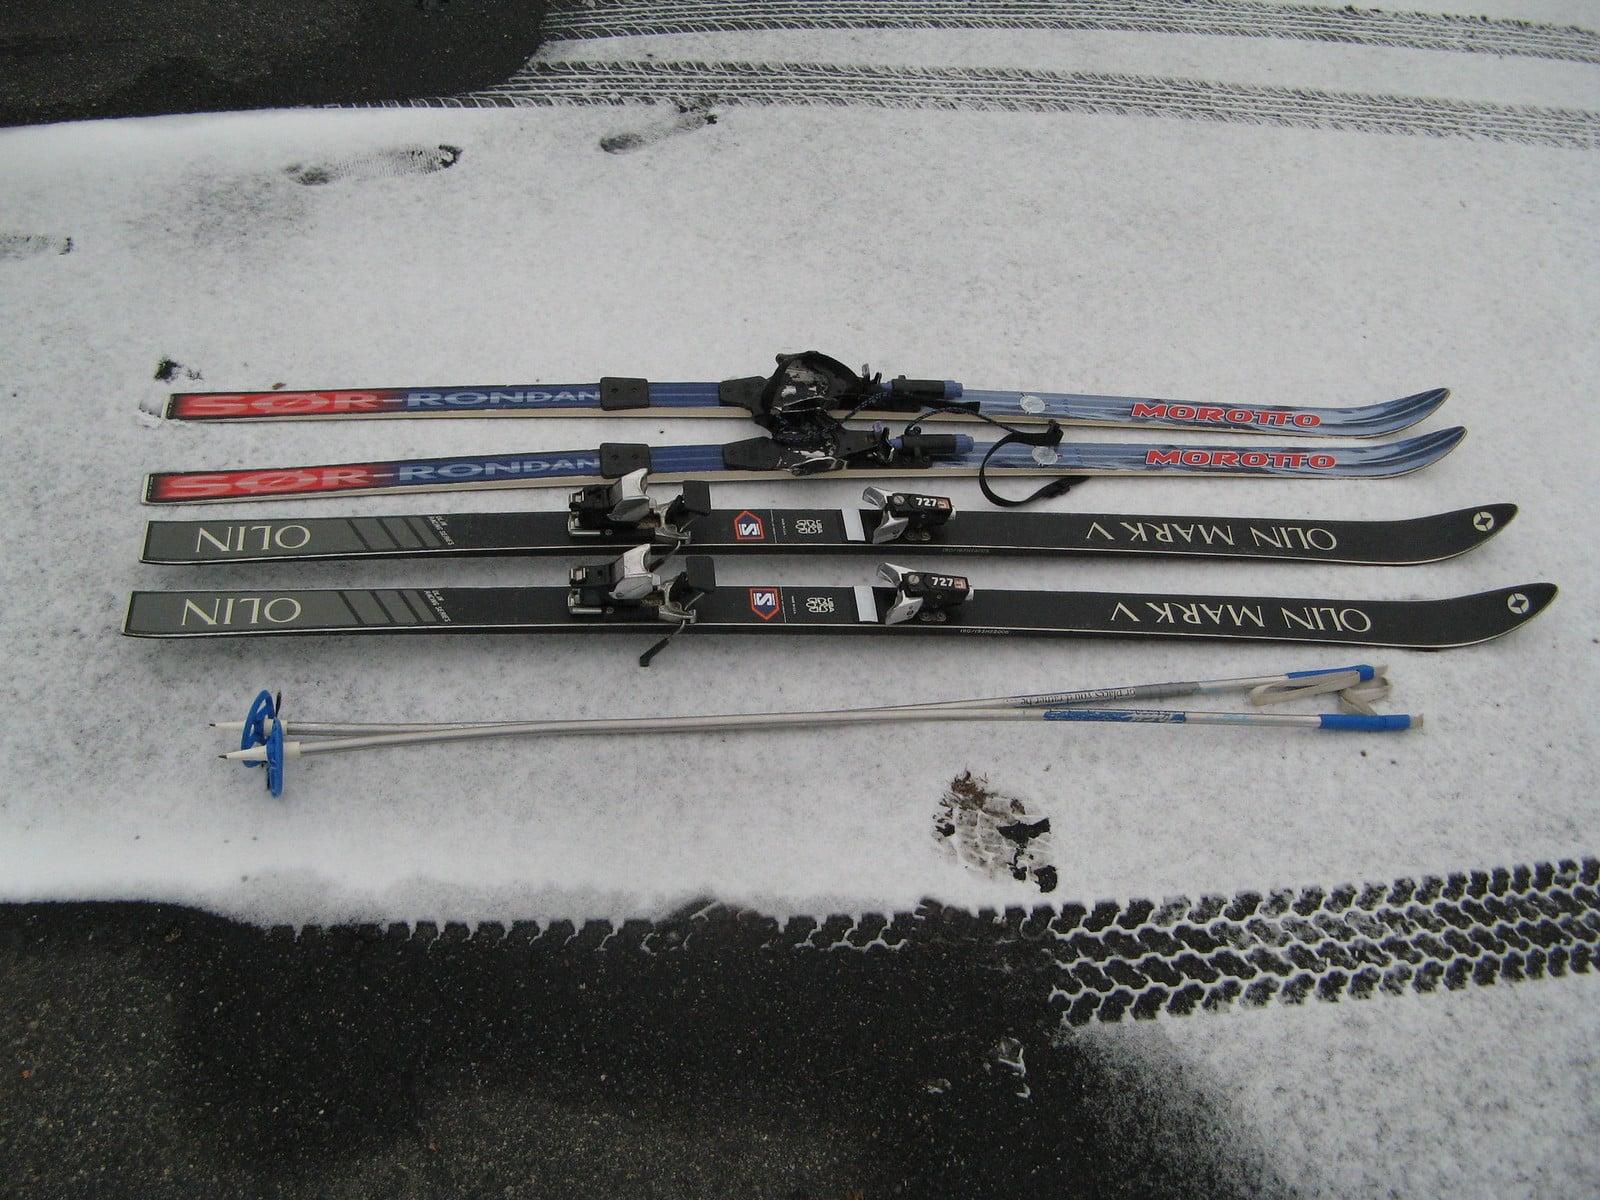 CALISTOUK Ski and Snowboard Edge Kit Care Ski Side Angle Tool Diamond Stone Sharpener Grinding Trimming Edge